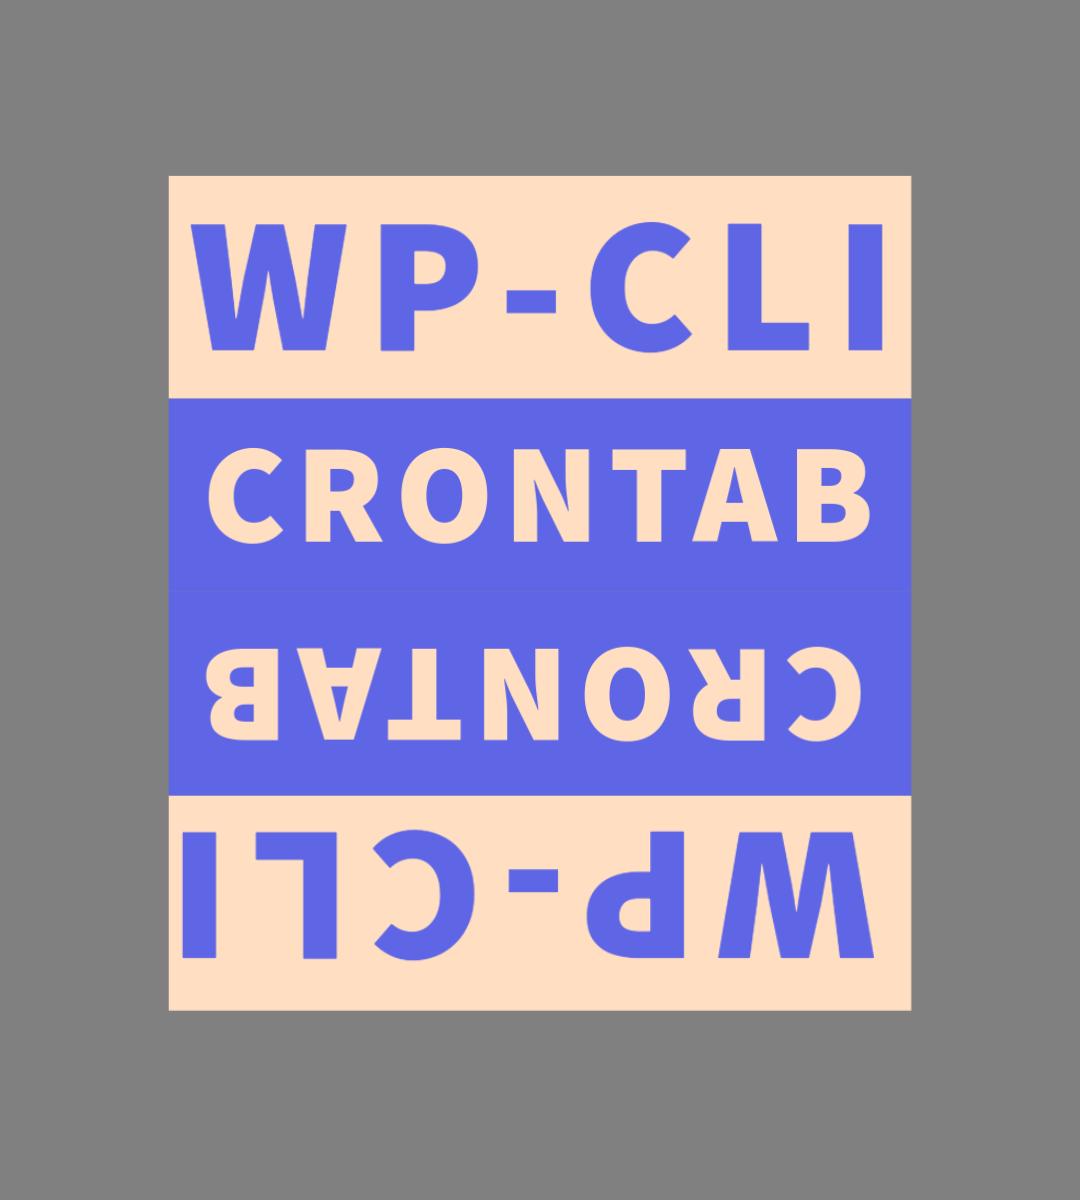 WP-Cli via Cron Job in Crontab